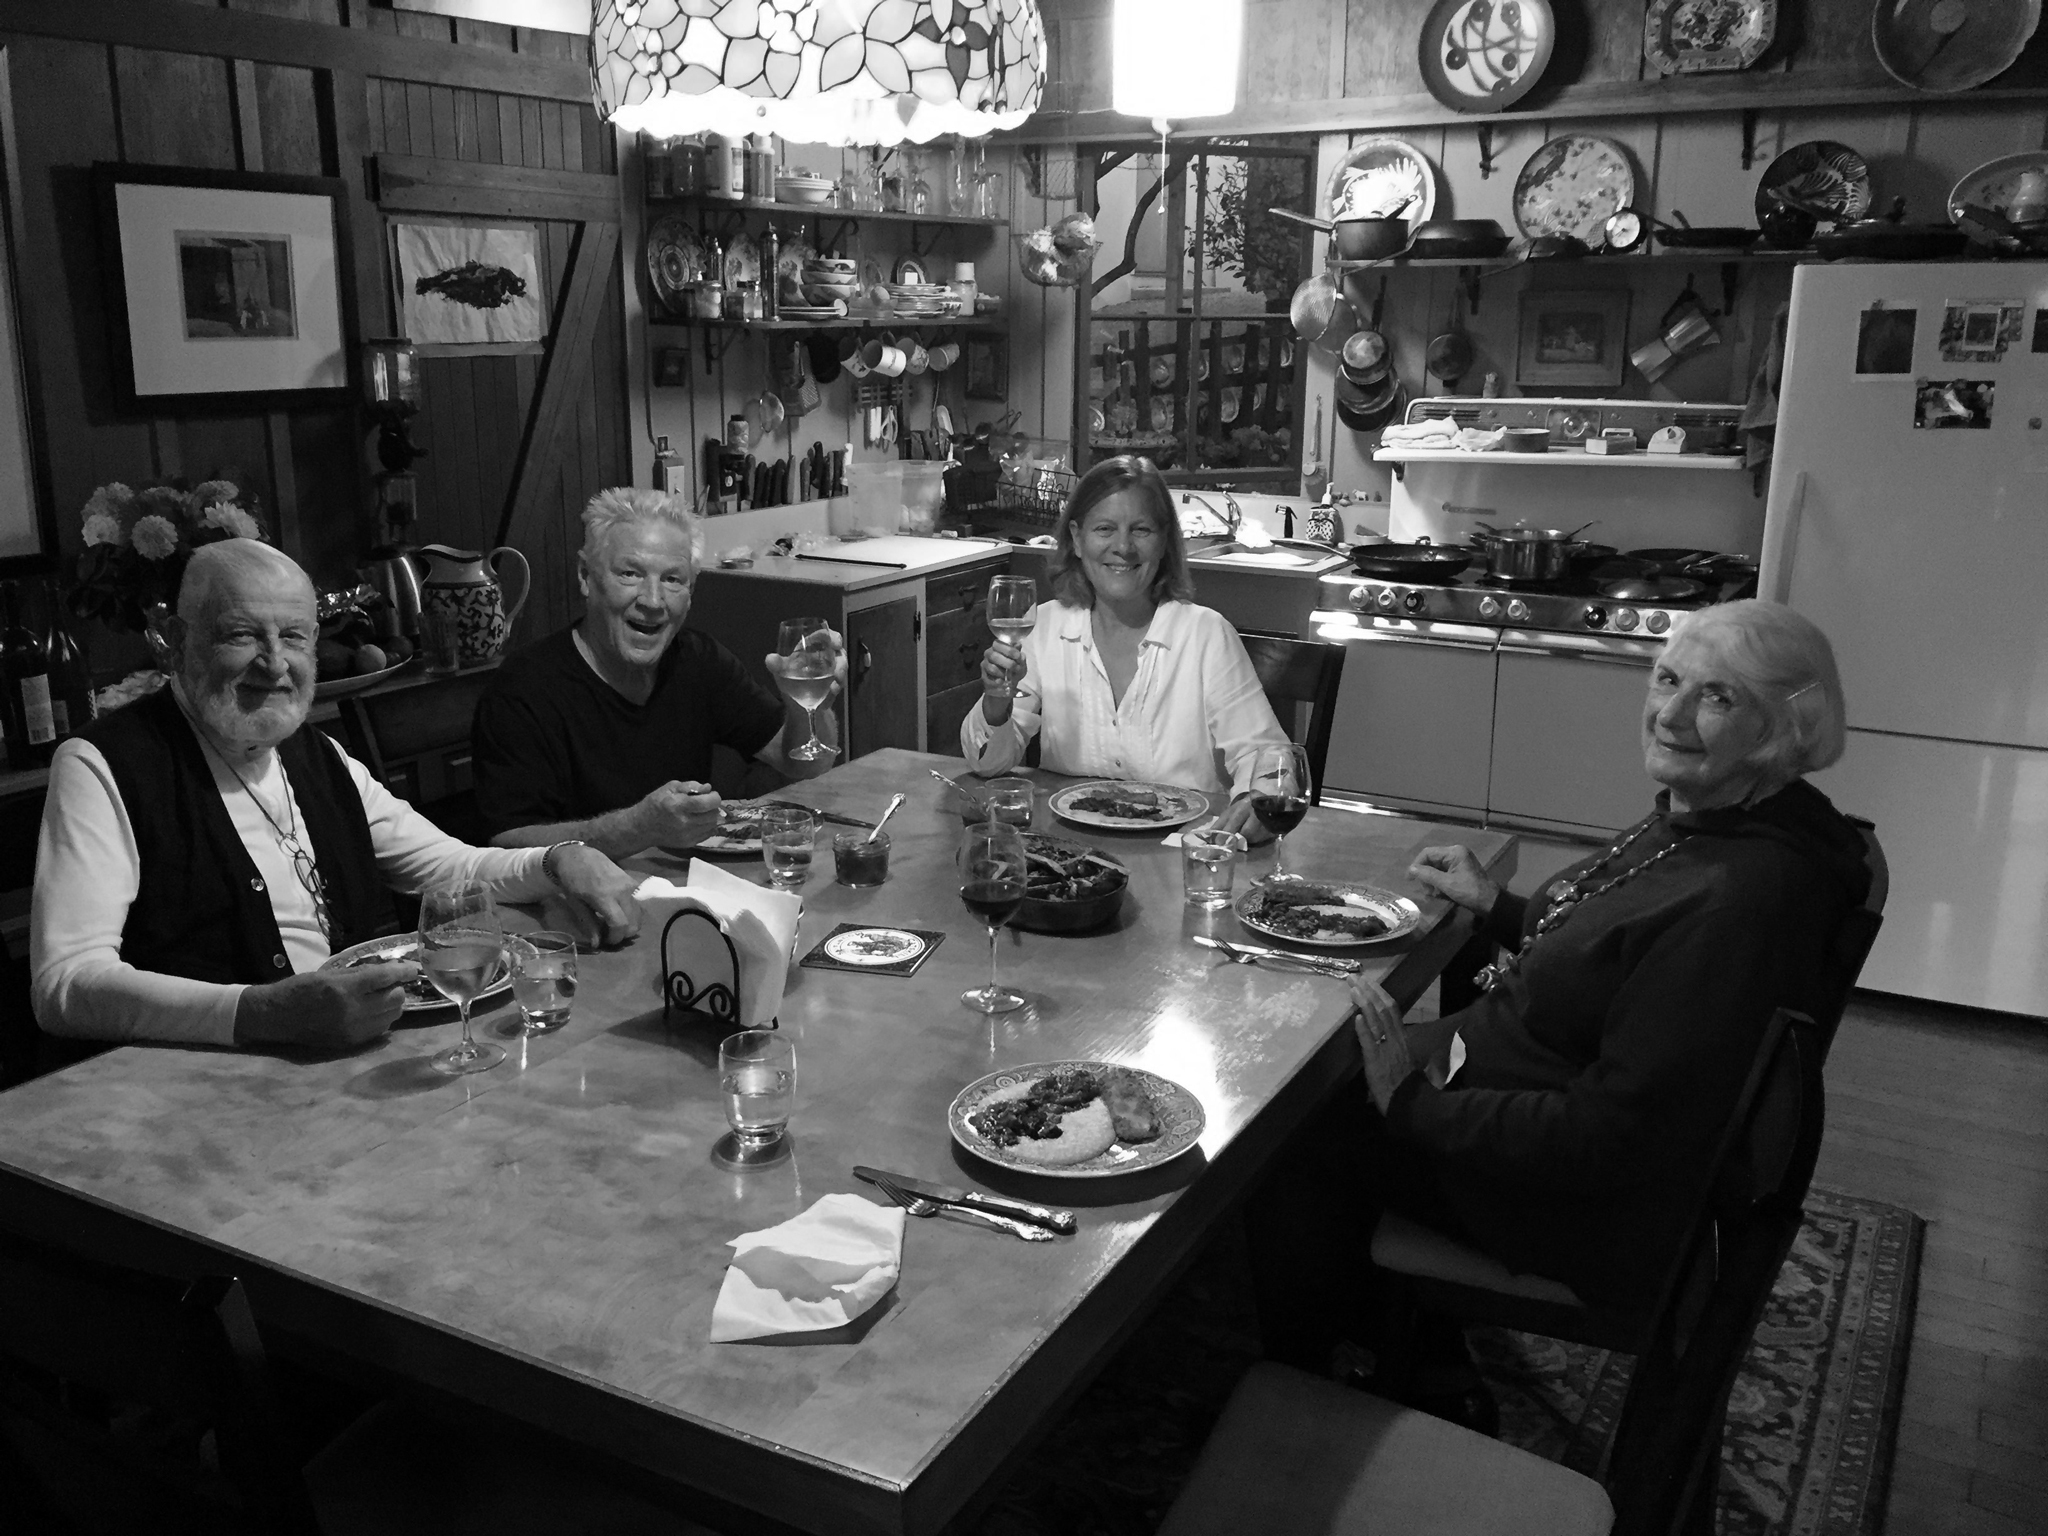 From Left: Michael Adams, Kim Weston, Gina Weston, and Gene Adams having dinner at Edward Weston's home on Wildcat Hill - 2017